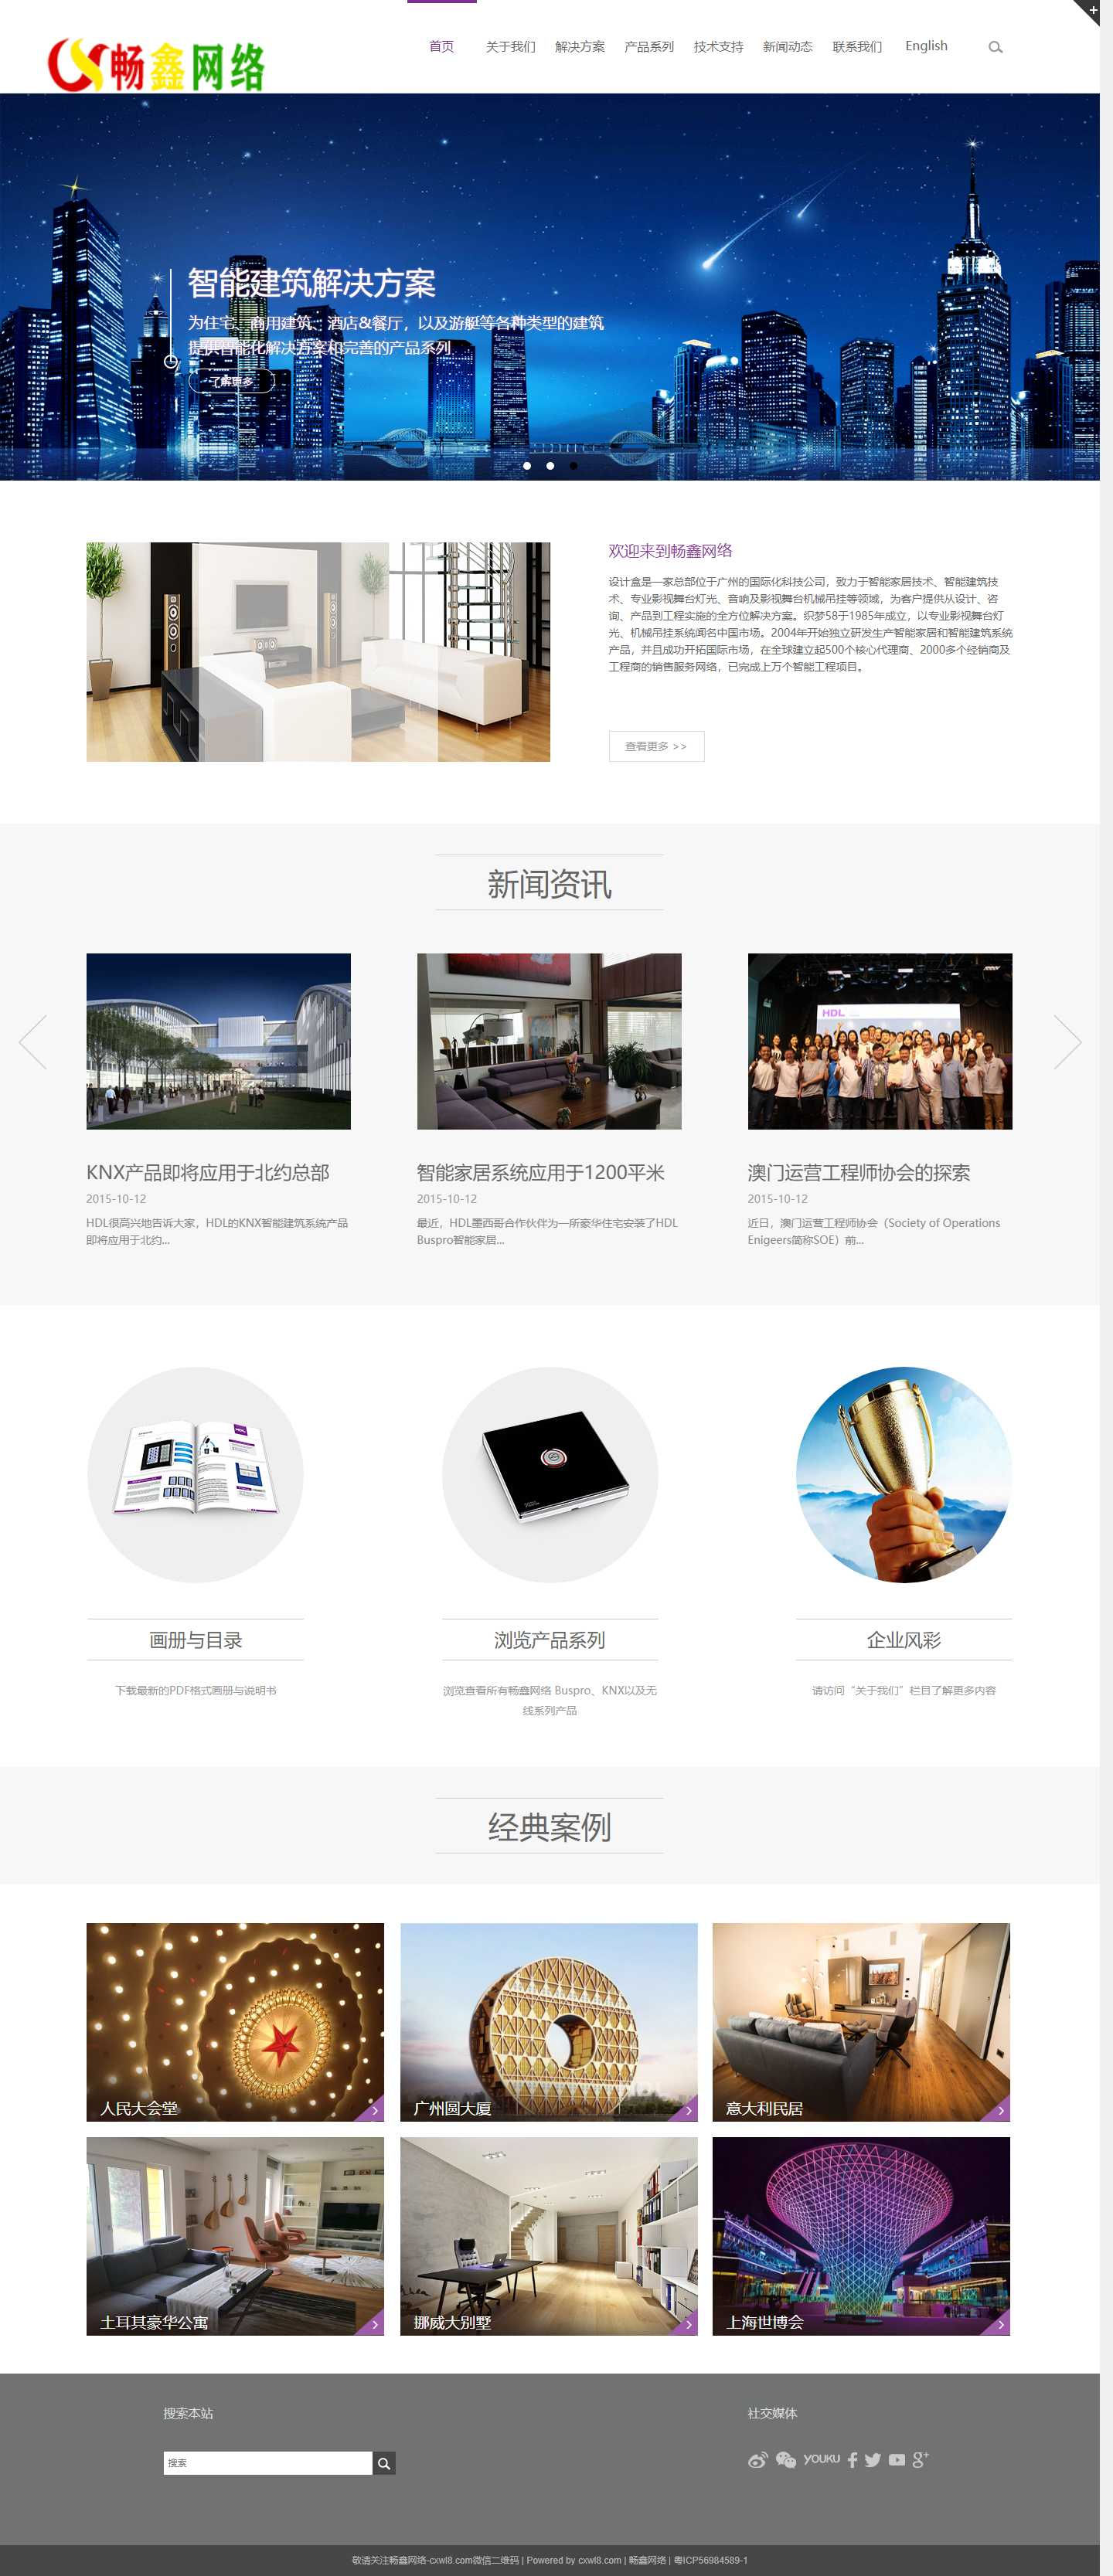 【J027】中英双语产品展示通用网站模板